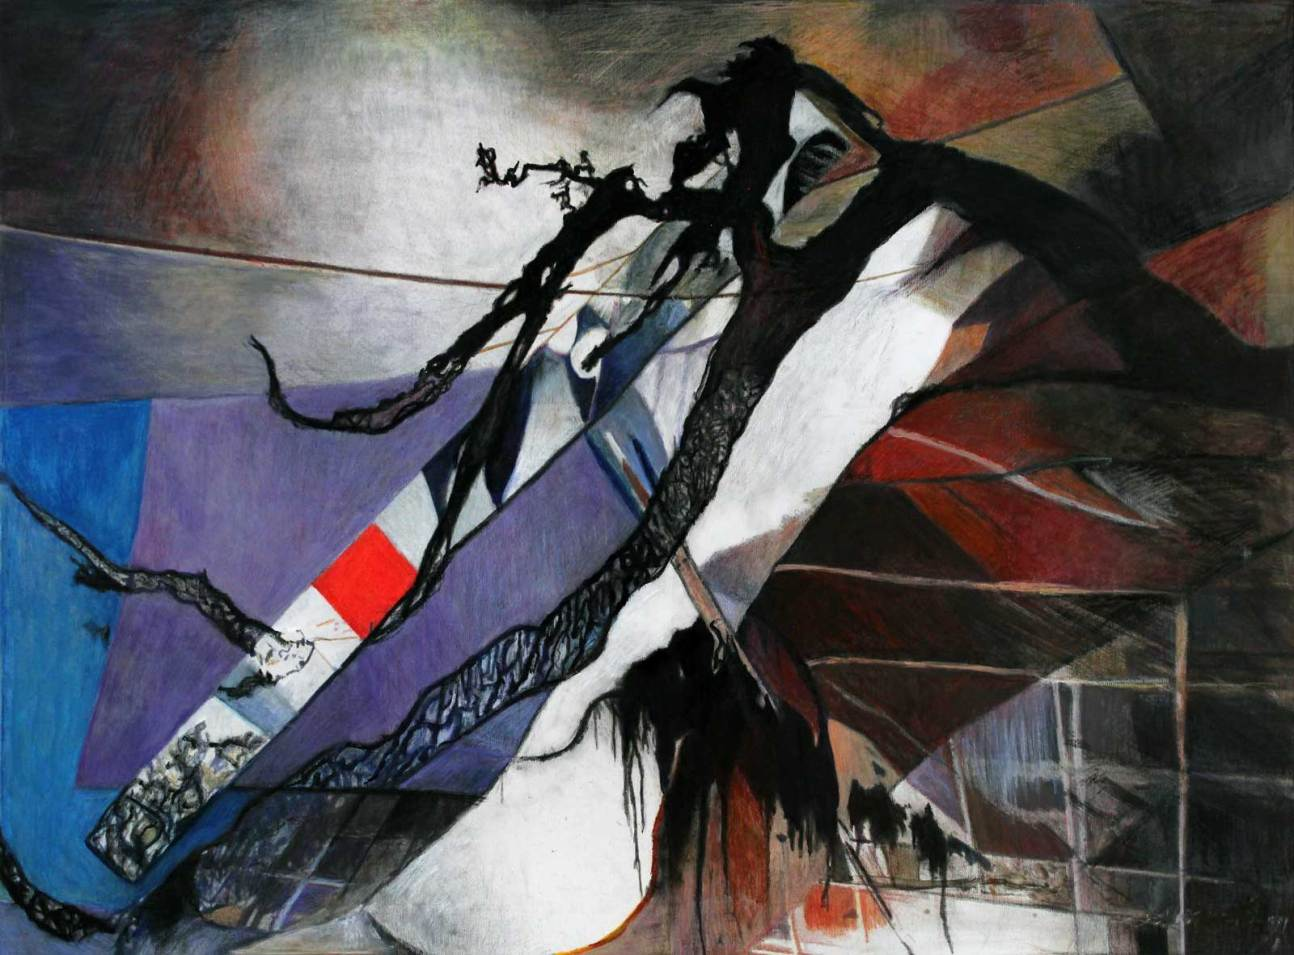 "Slice of Eternity 30"" x 47"" Mixed Media on Canvas"